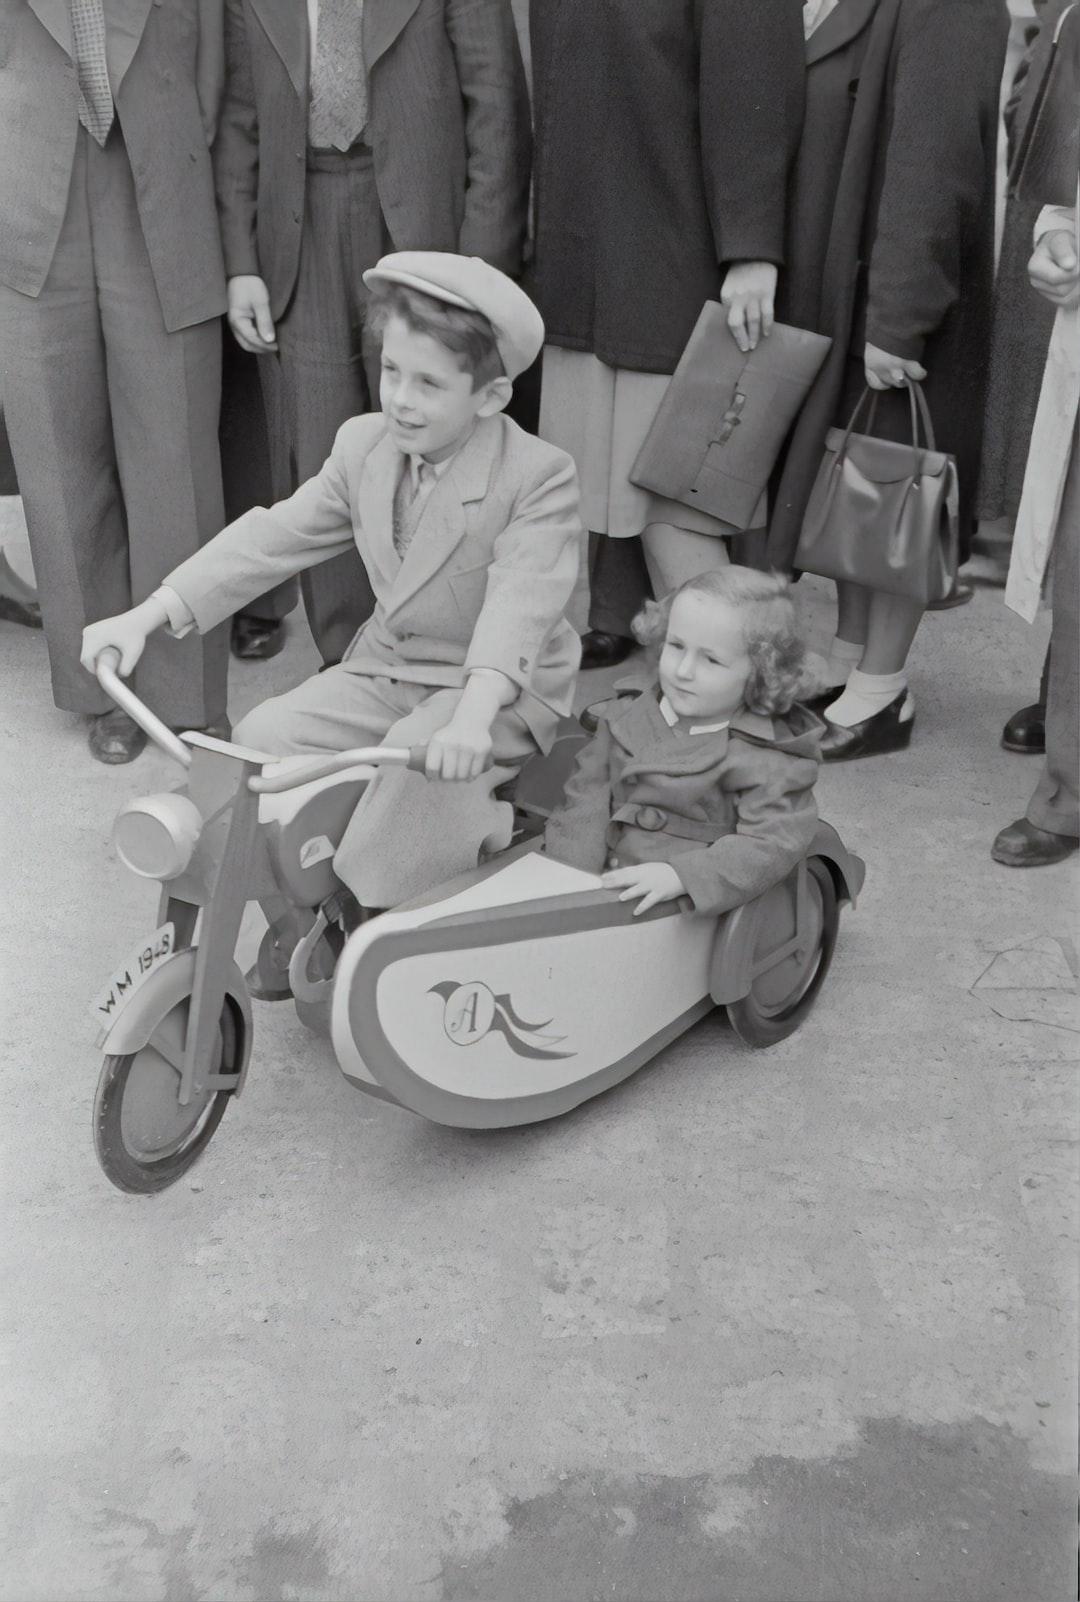 Little boy with sidecar machine.1948